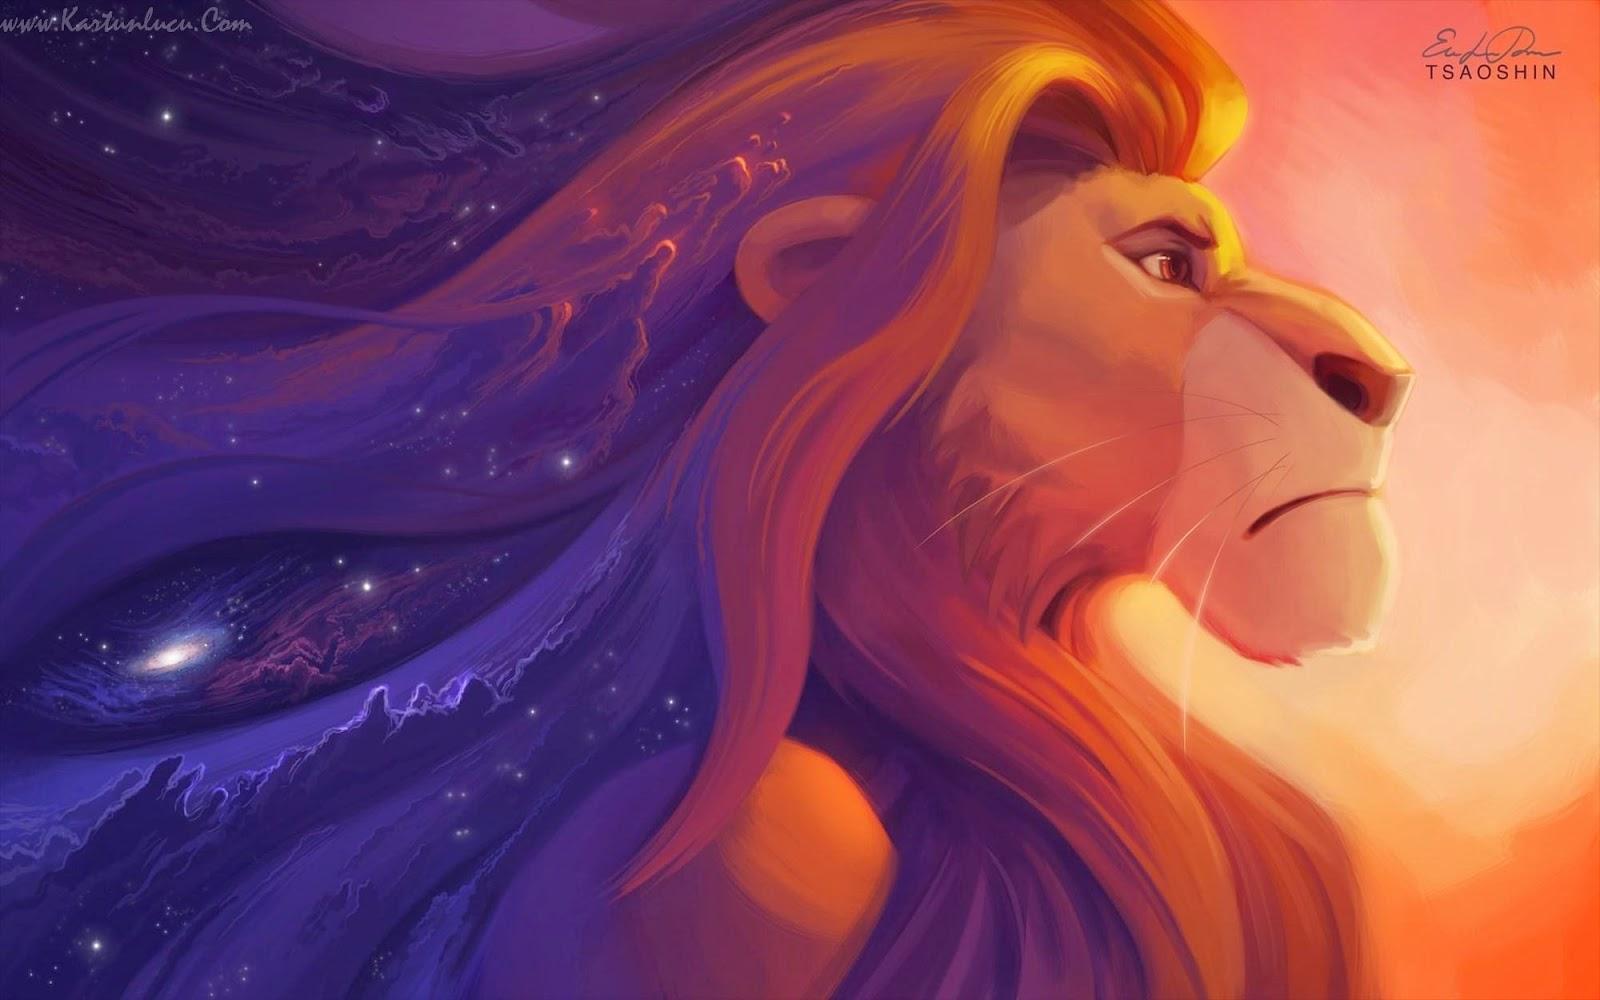 WALLPAPER SIMBA LION KING Gambar Kartun Lucu Dan Wallpaper Keren